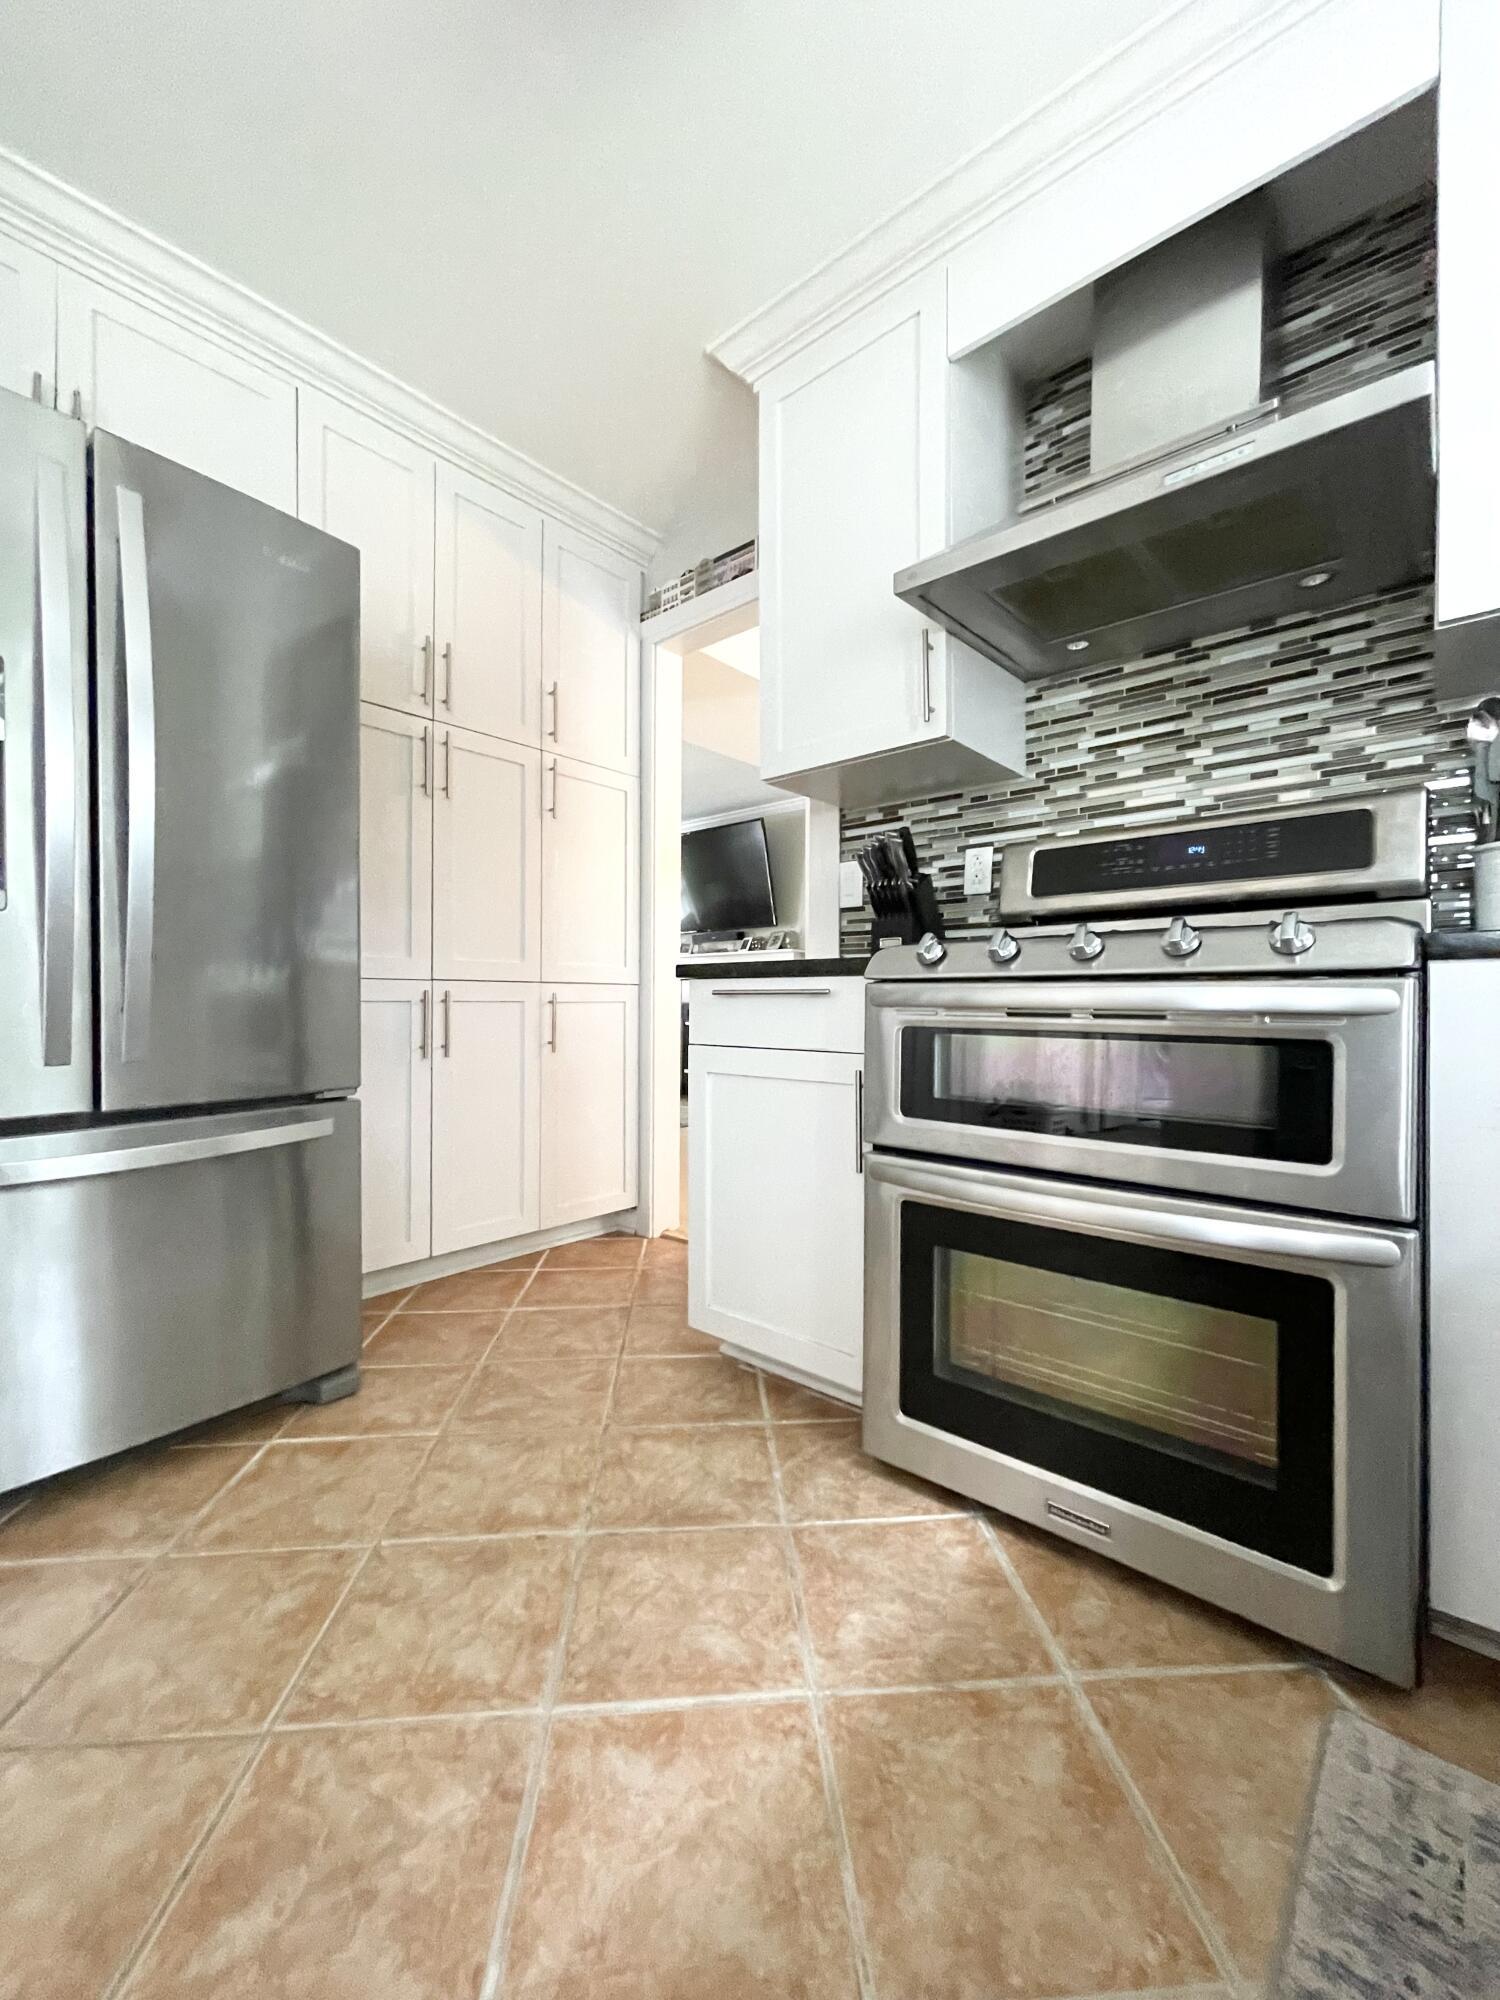 Quail Hollow Homes For Sale - 1364 Downsberry, Mount Pleasant, SC - 9